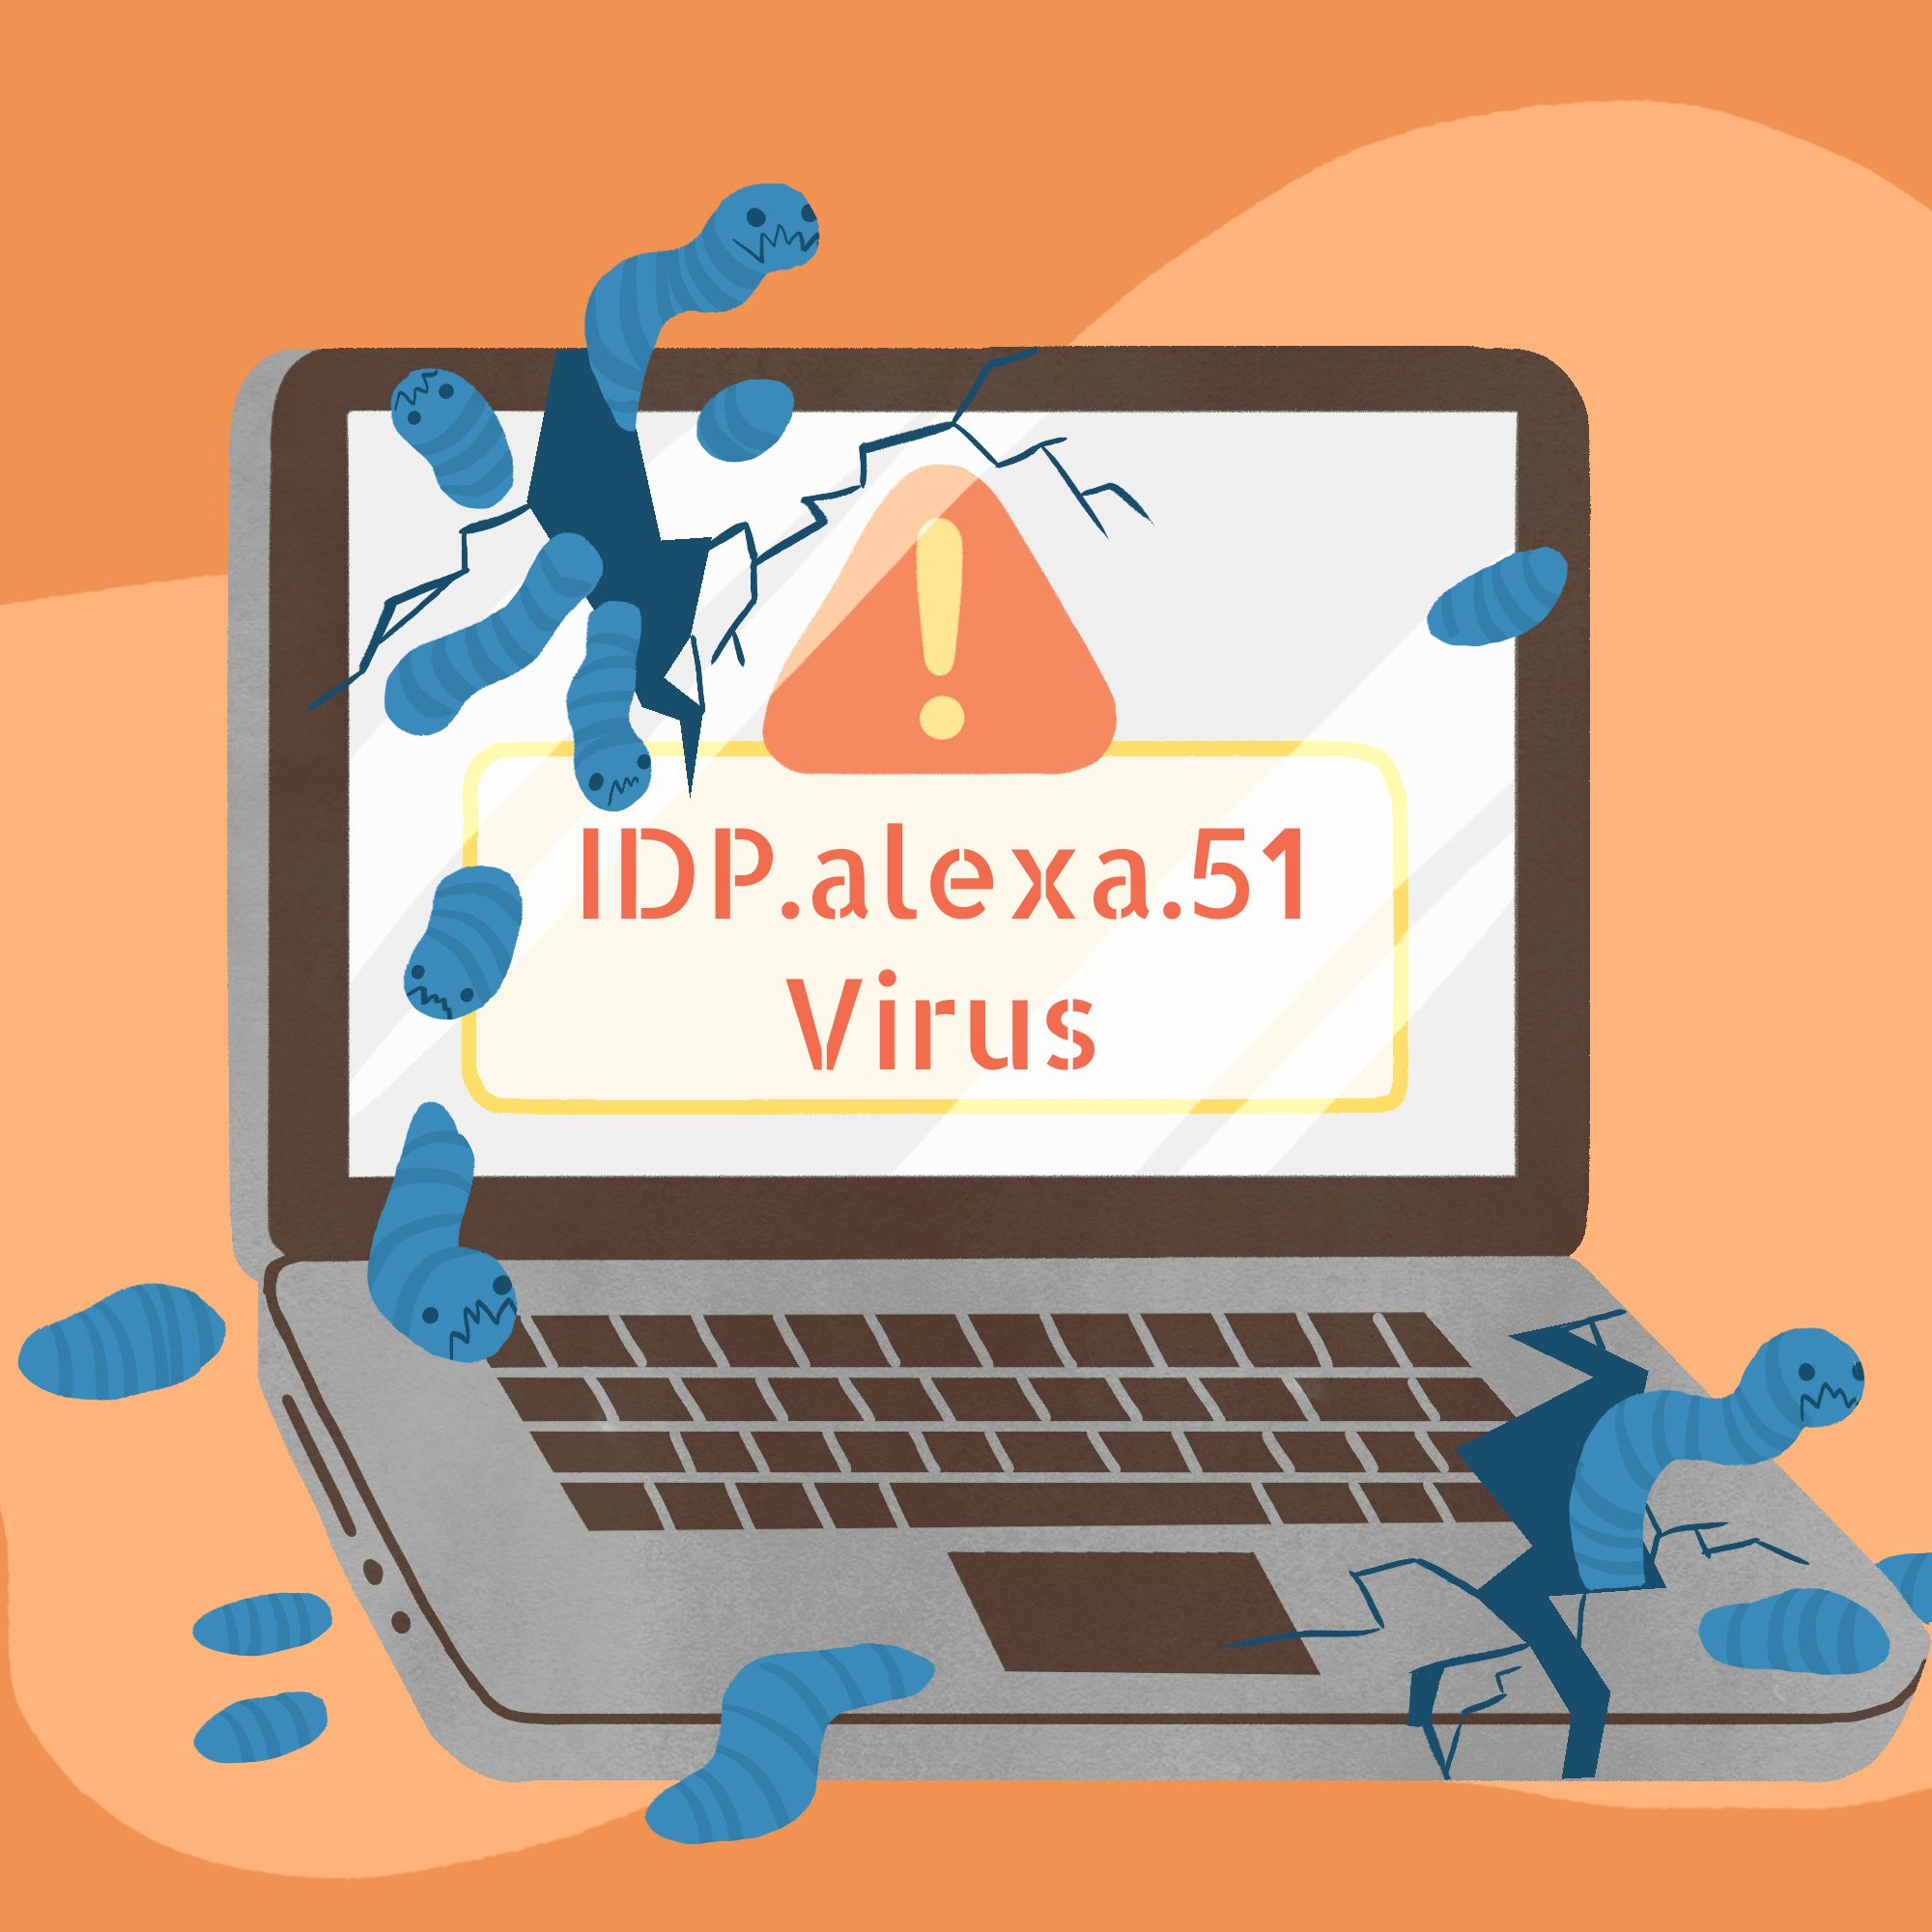 The IDP.alexa.51(aka Alexa) Virus: What It Is & How to Remove It